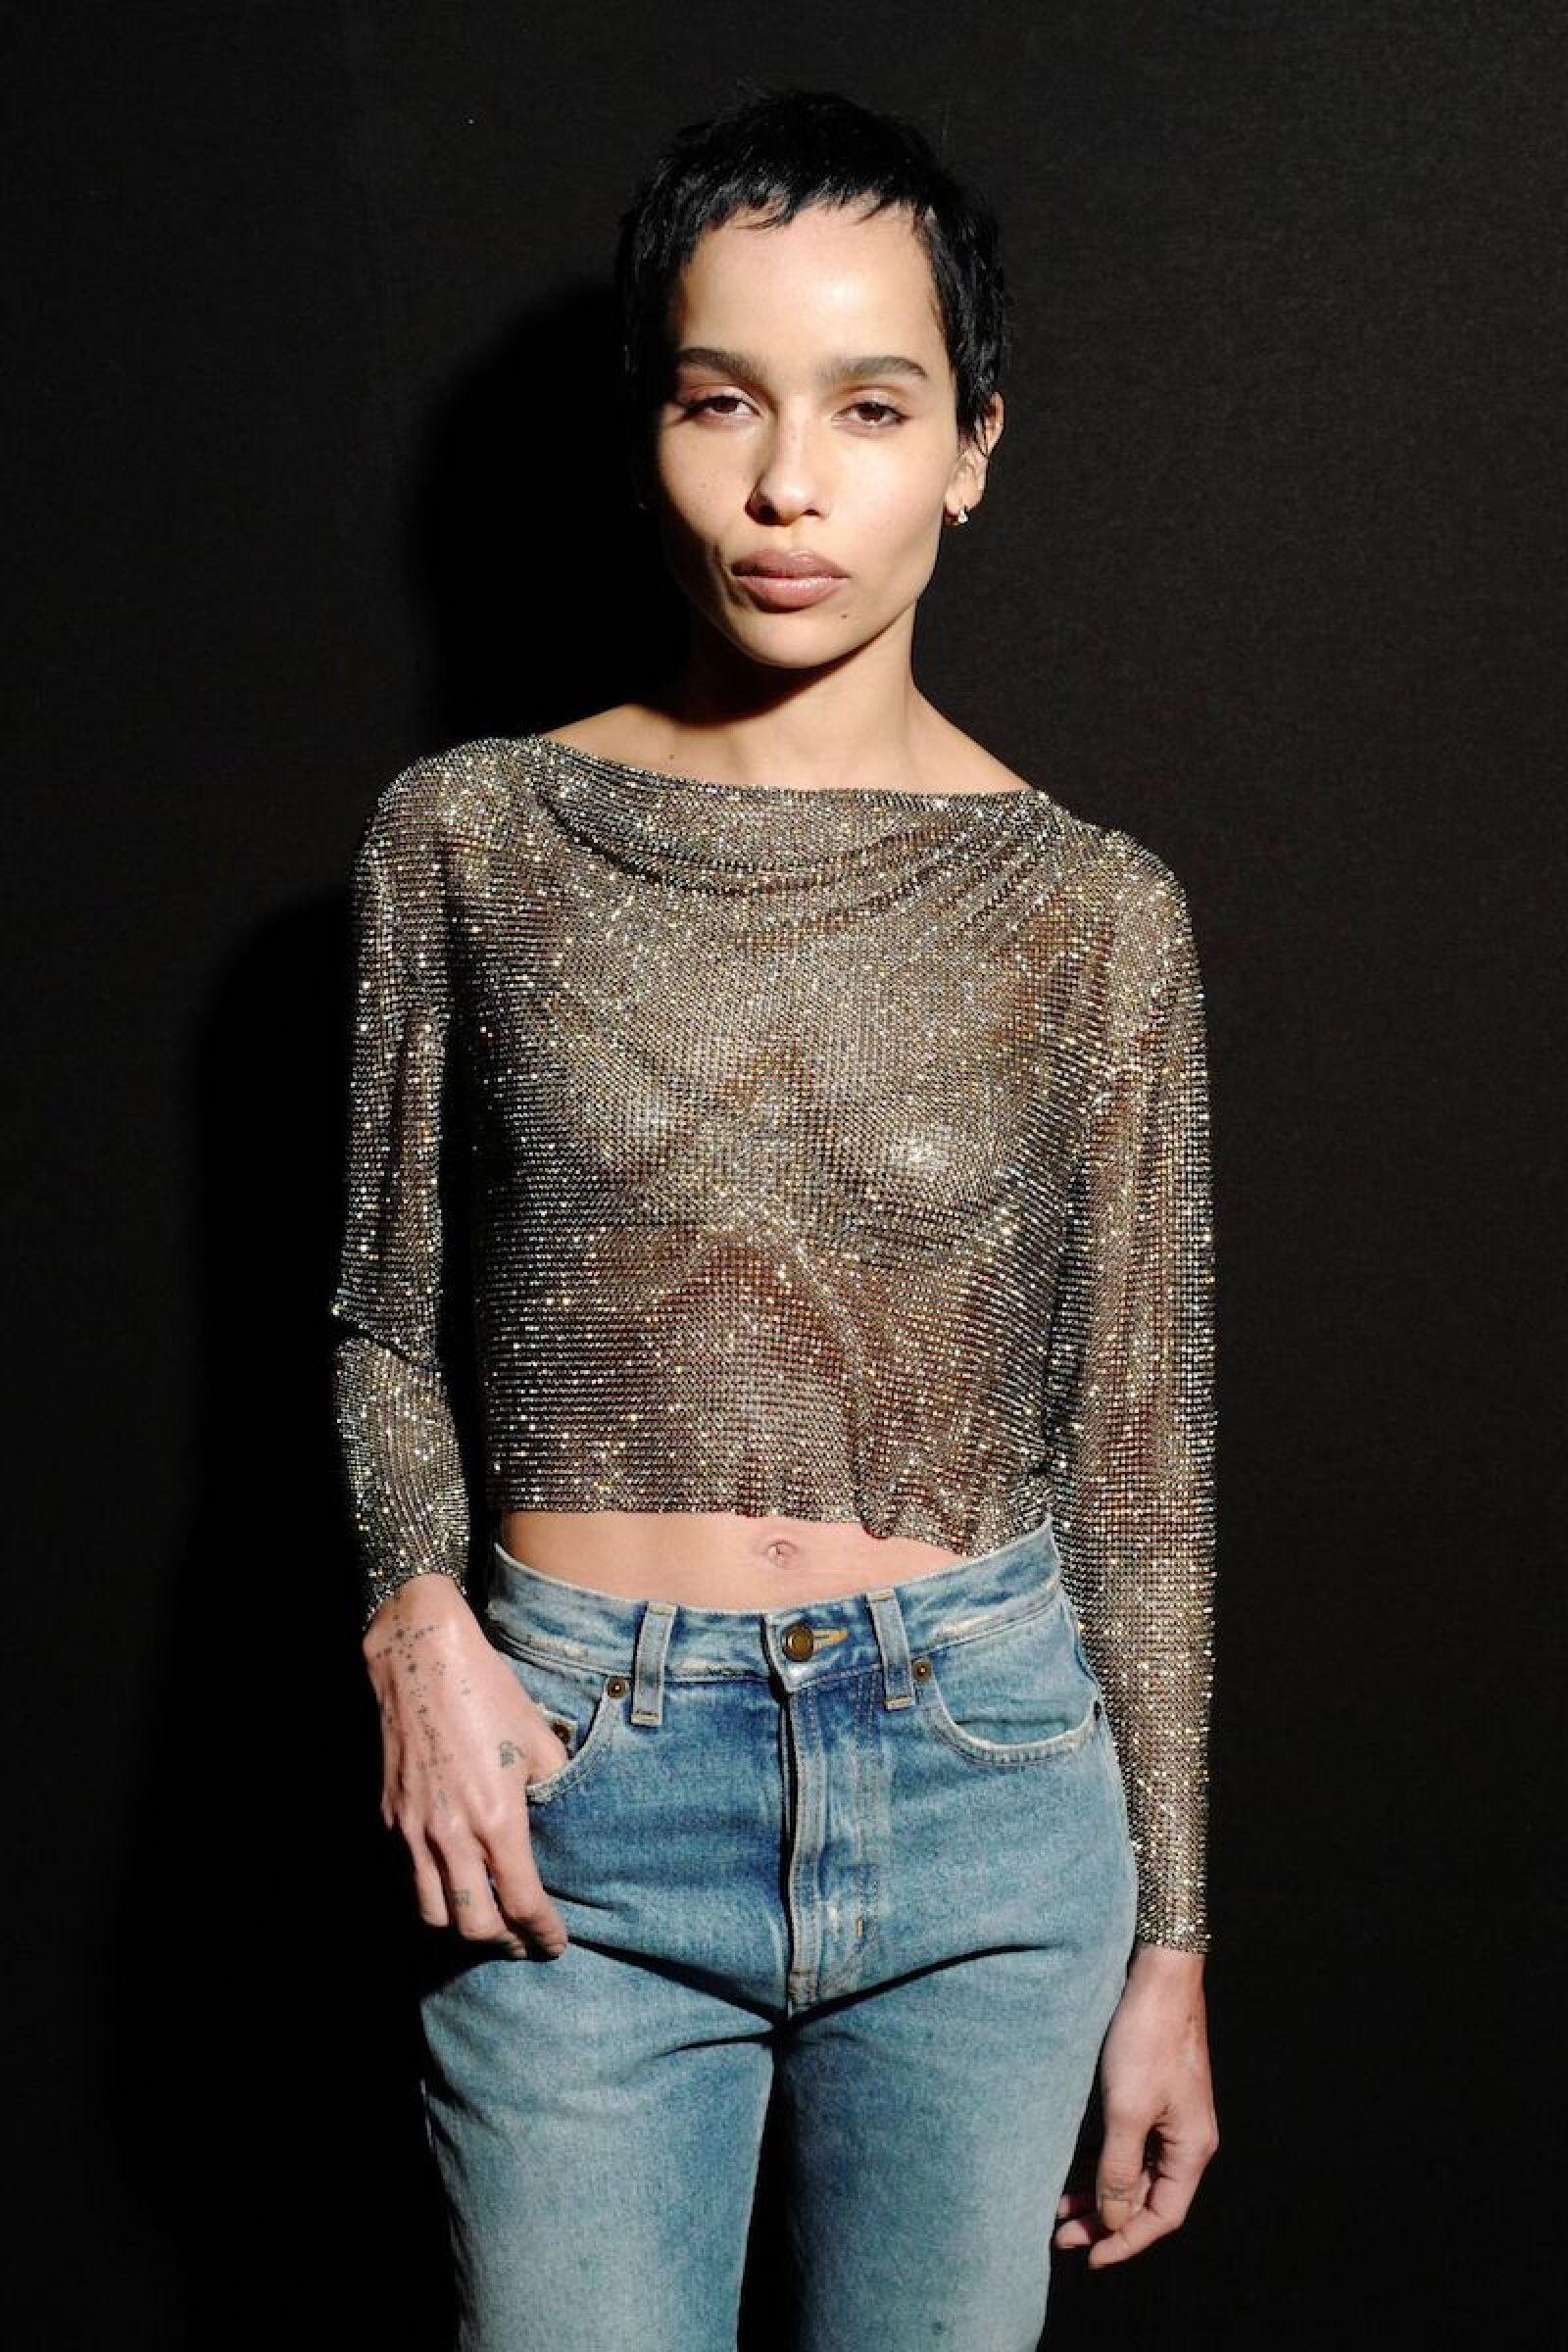 Saint Laurent show, Front Row, Fall Winter 2020, Paris Fashion Week, France - 25 Feb 2020